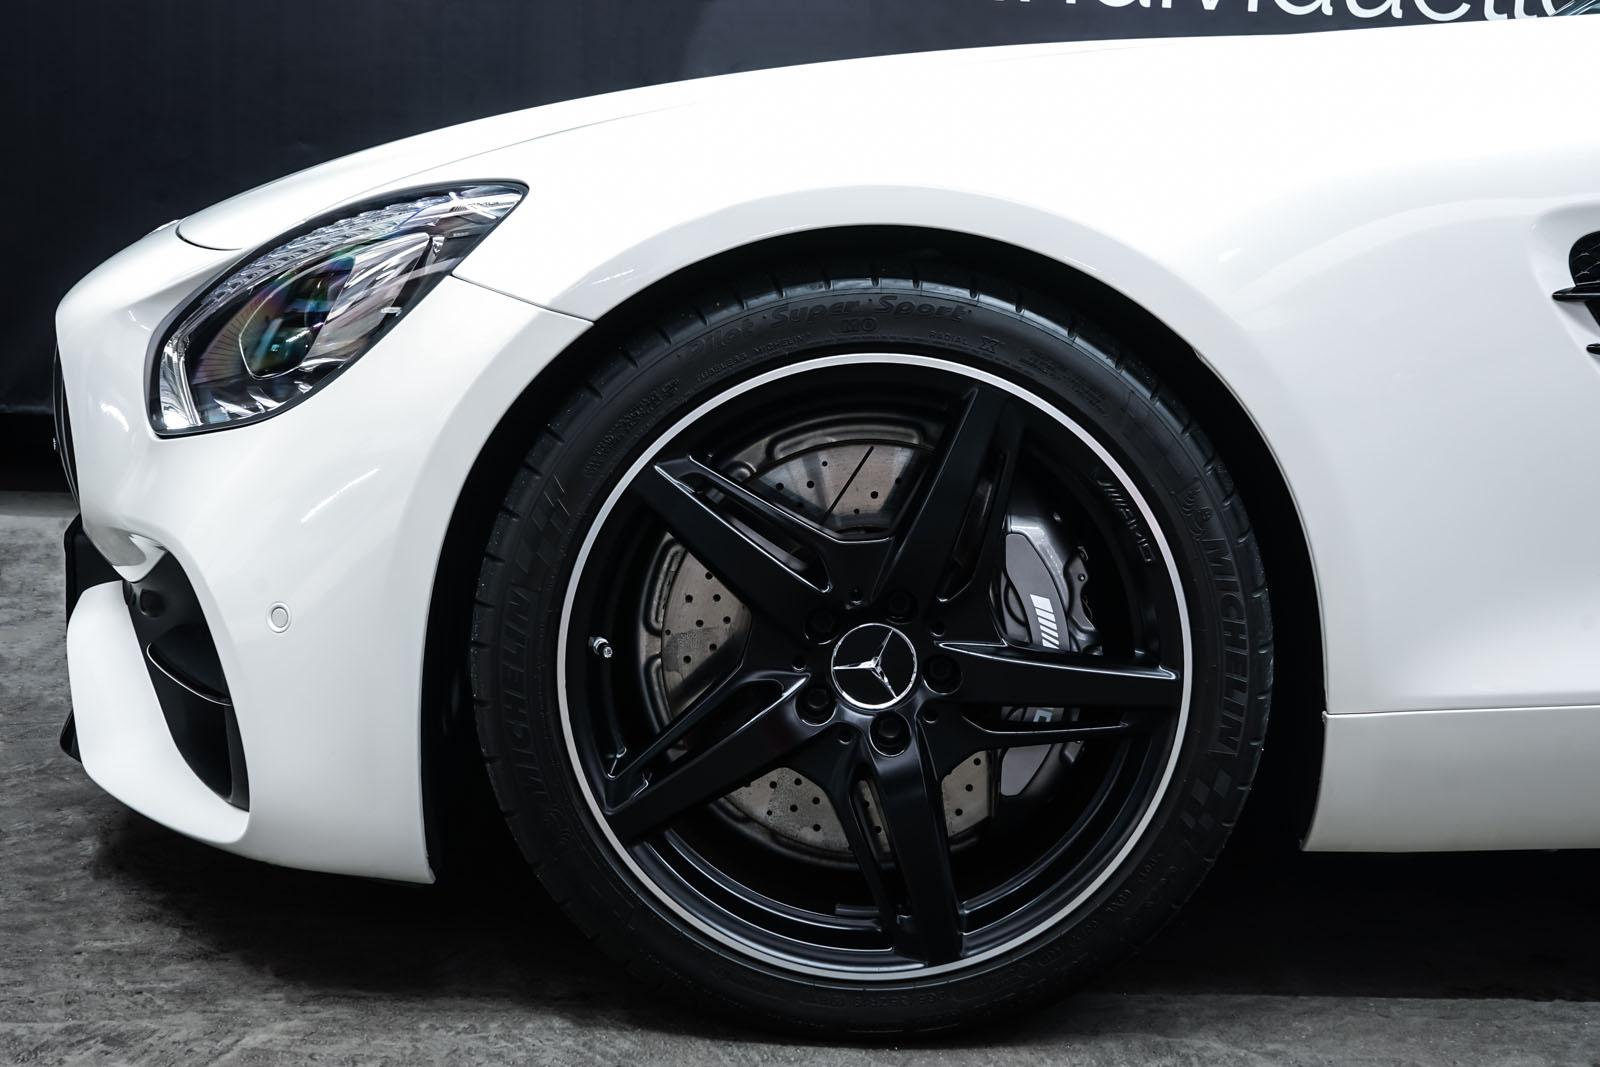 11Mercedes_Benz_AMG_GT_Roadster_Weiss_Schwarz_MB-9710_3_w